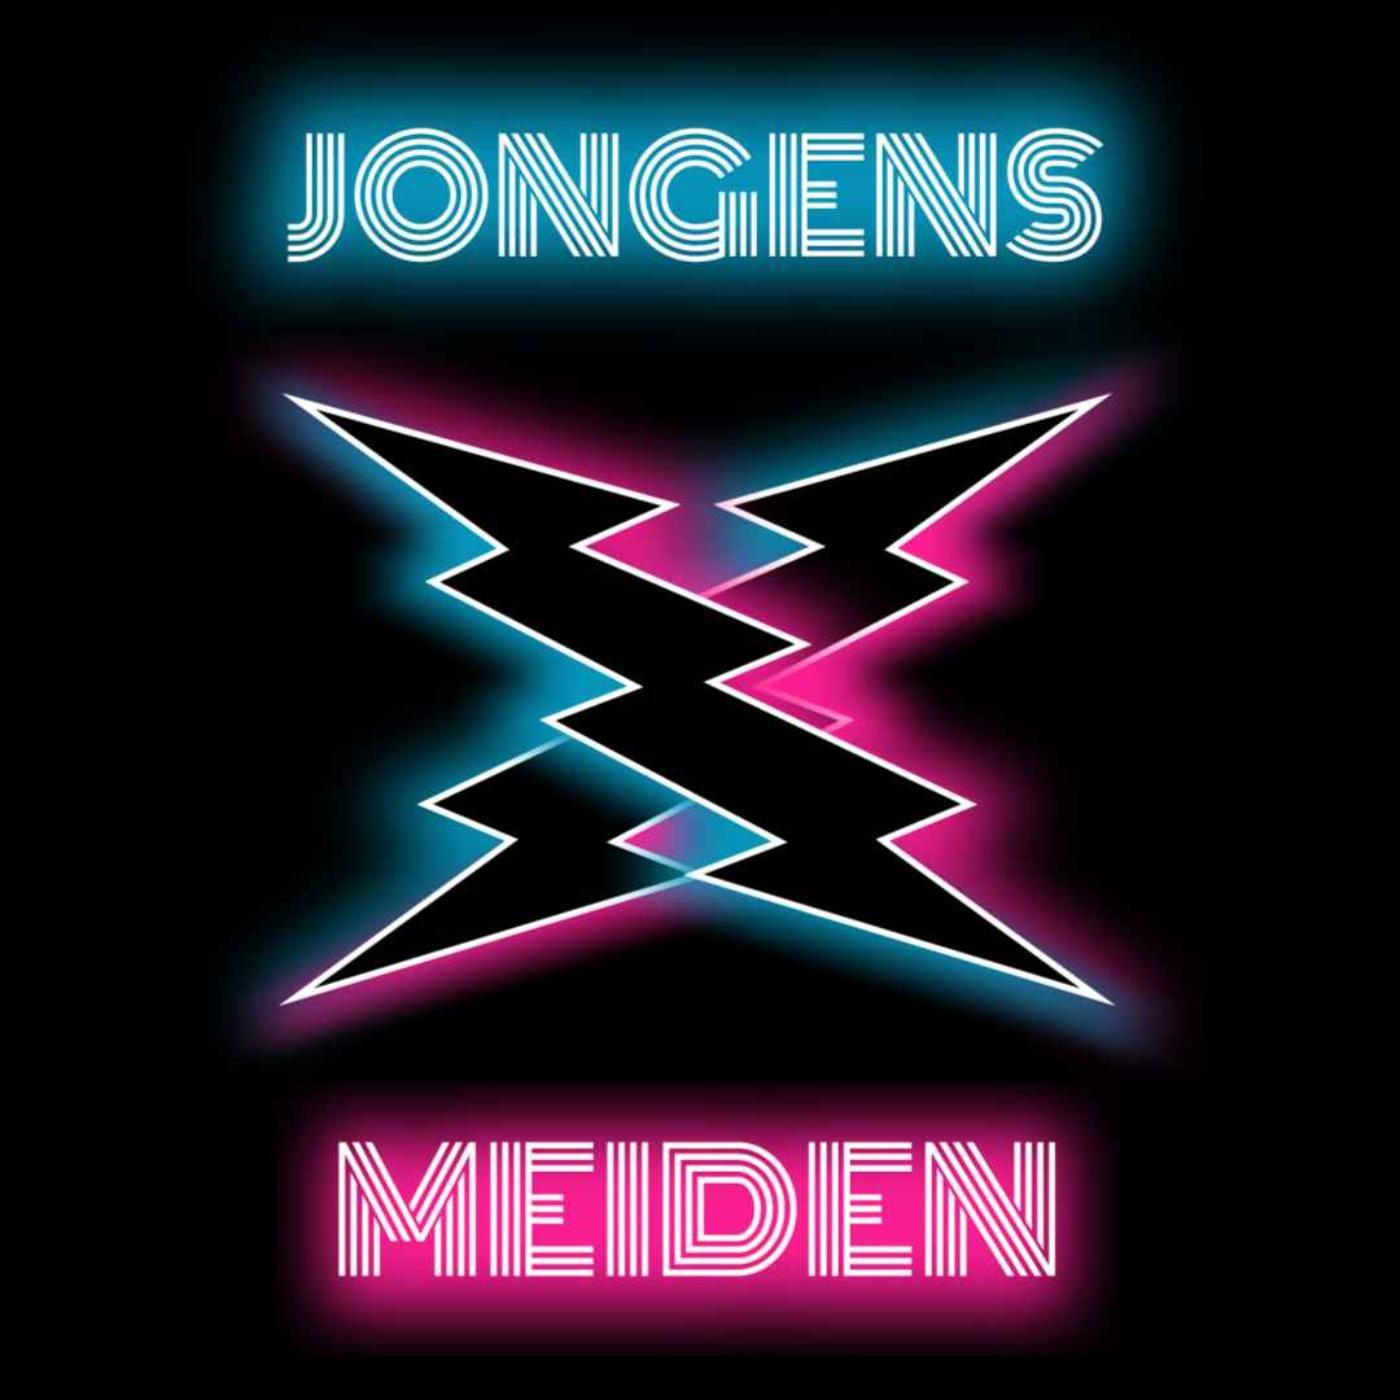 Jongens X Meiden logo